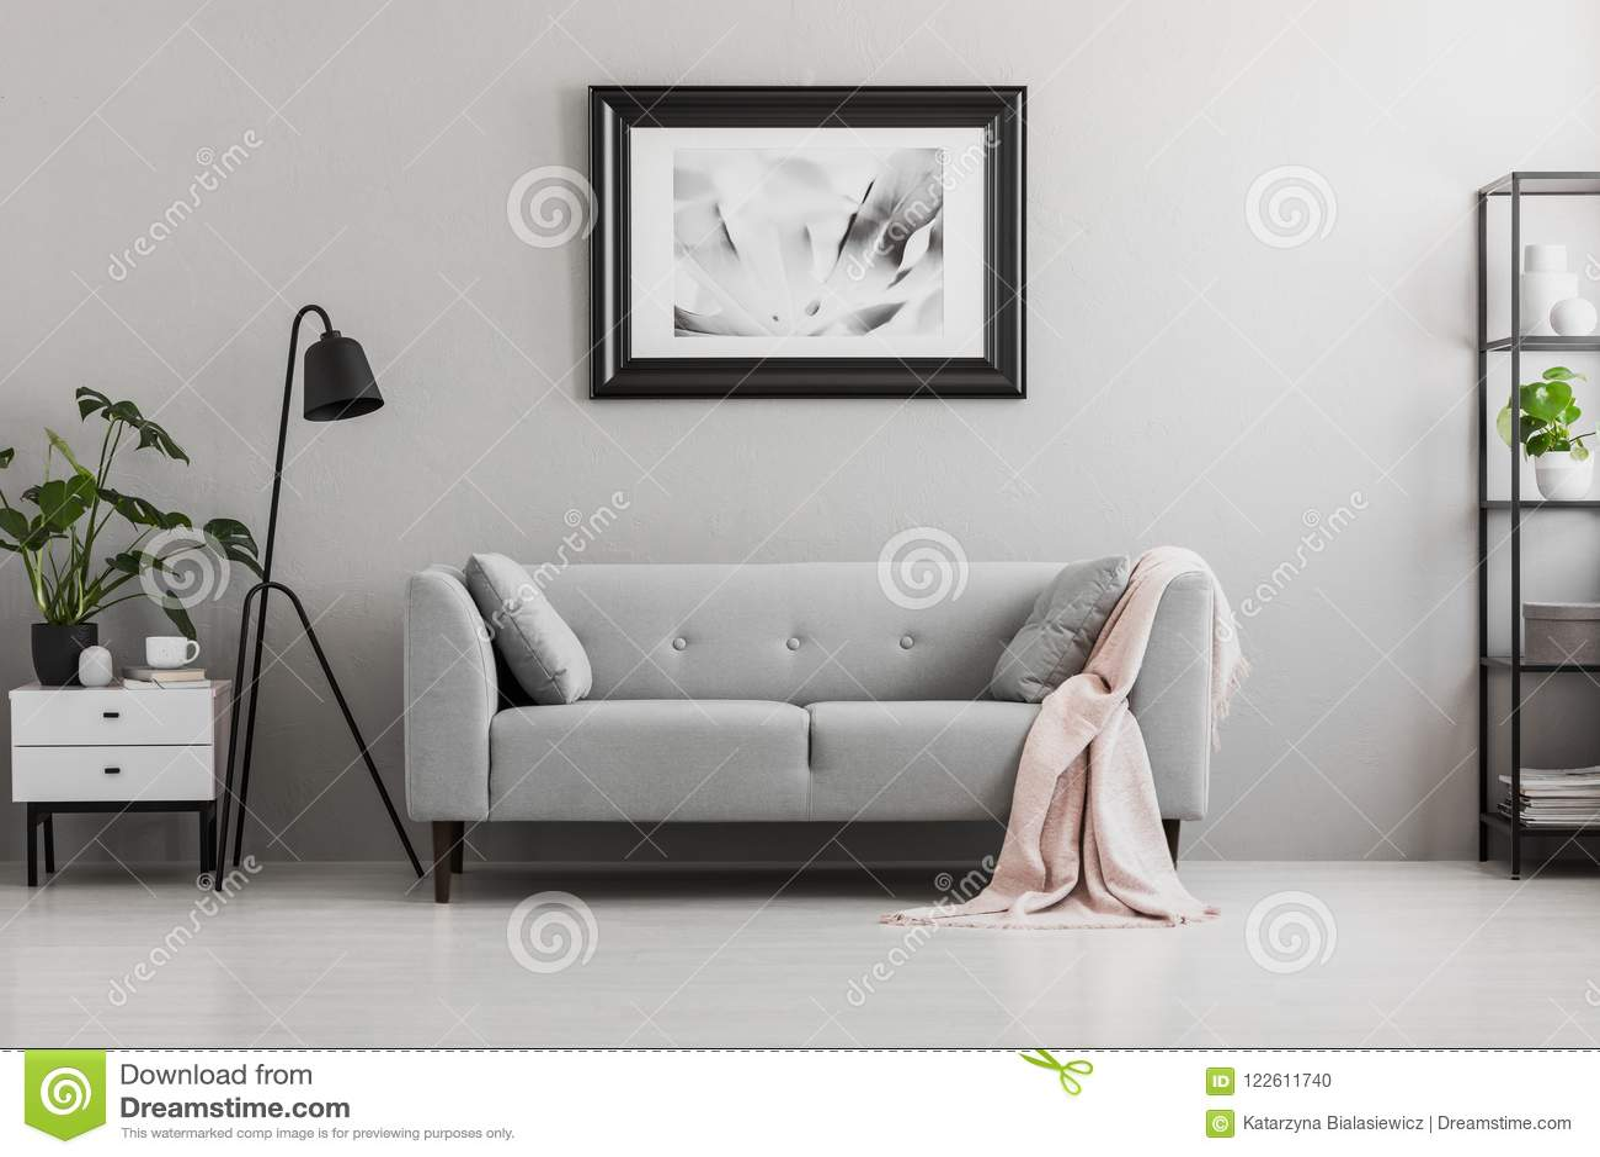 Industrial black floor lamp and a pink blanket on an - Elegant floor lamps for living room ...